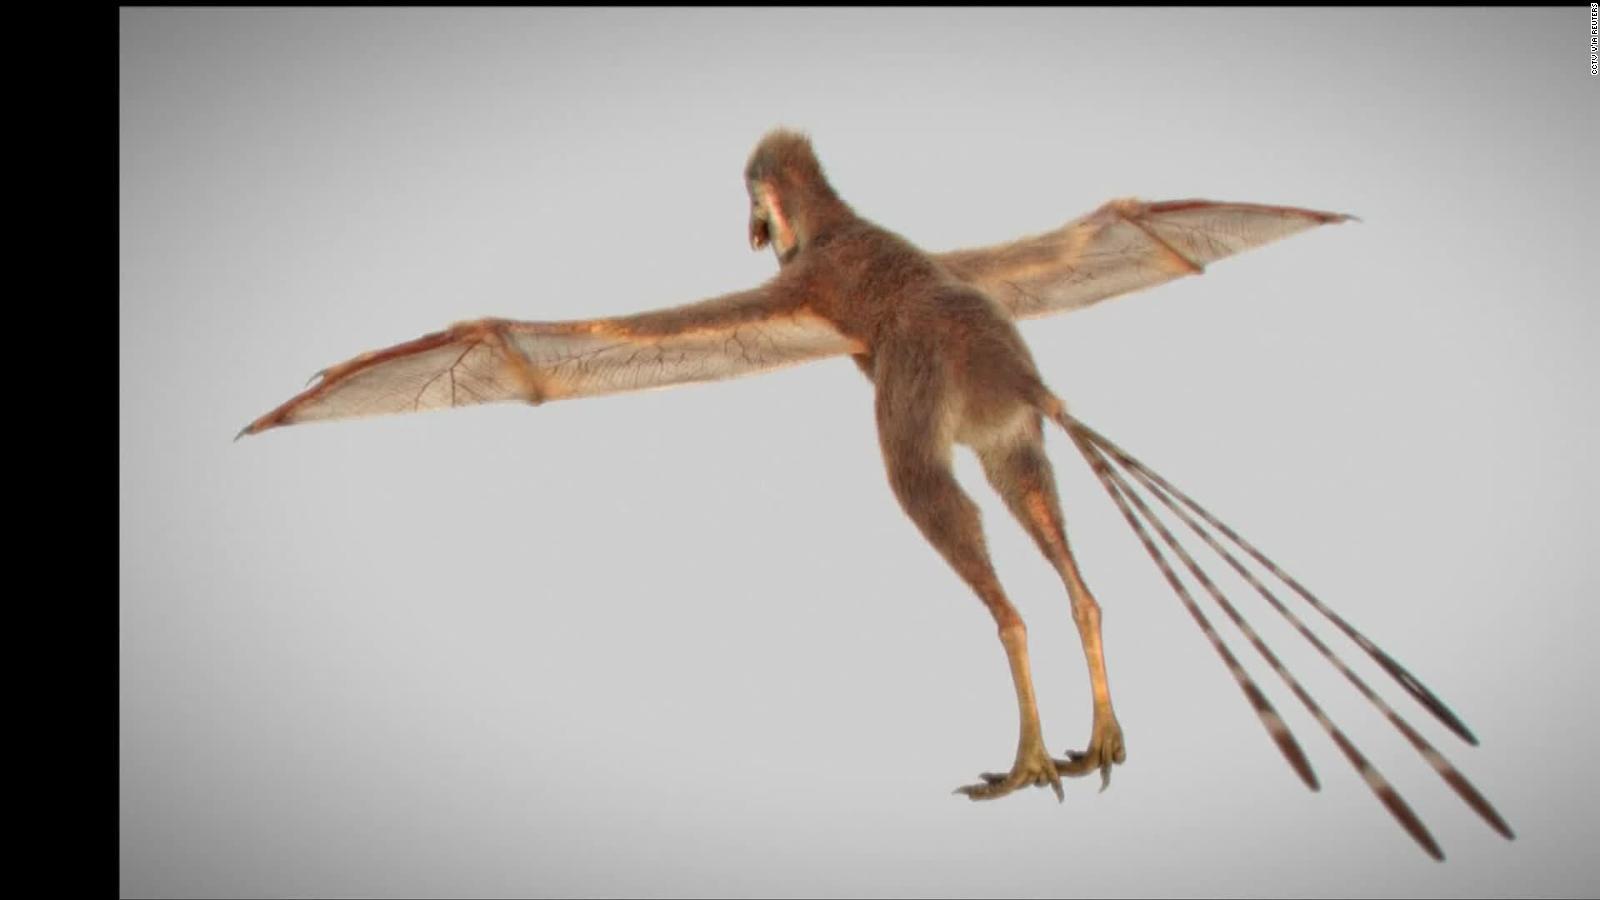 Descubren Fosiles De Dinosaurios Voladores Parecidos A Los Murcielagos Video Cnn Los pterosaurios no son dinosaurios voladores, son reptiles voladores. de dinosaurios voladores parecidos